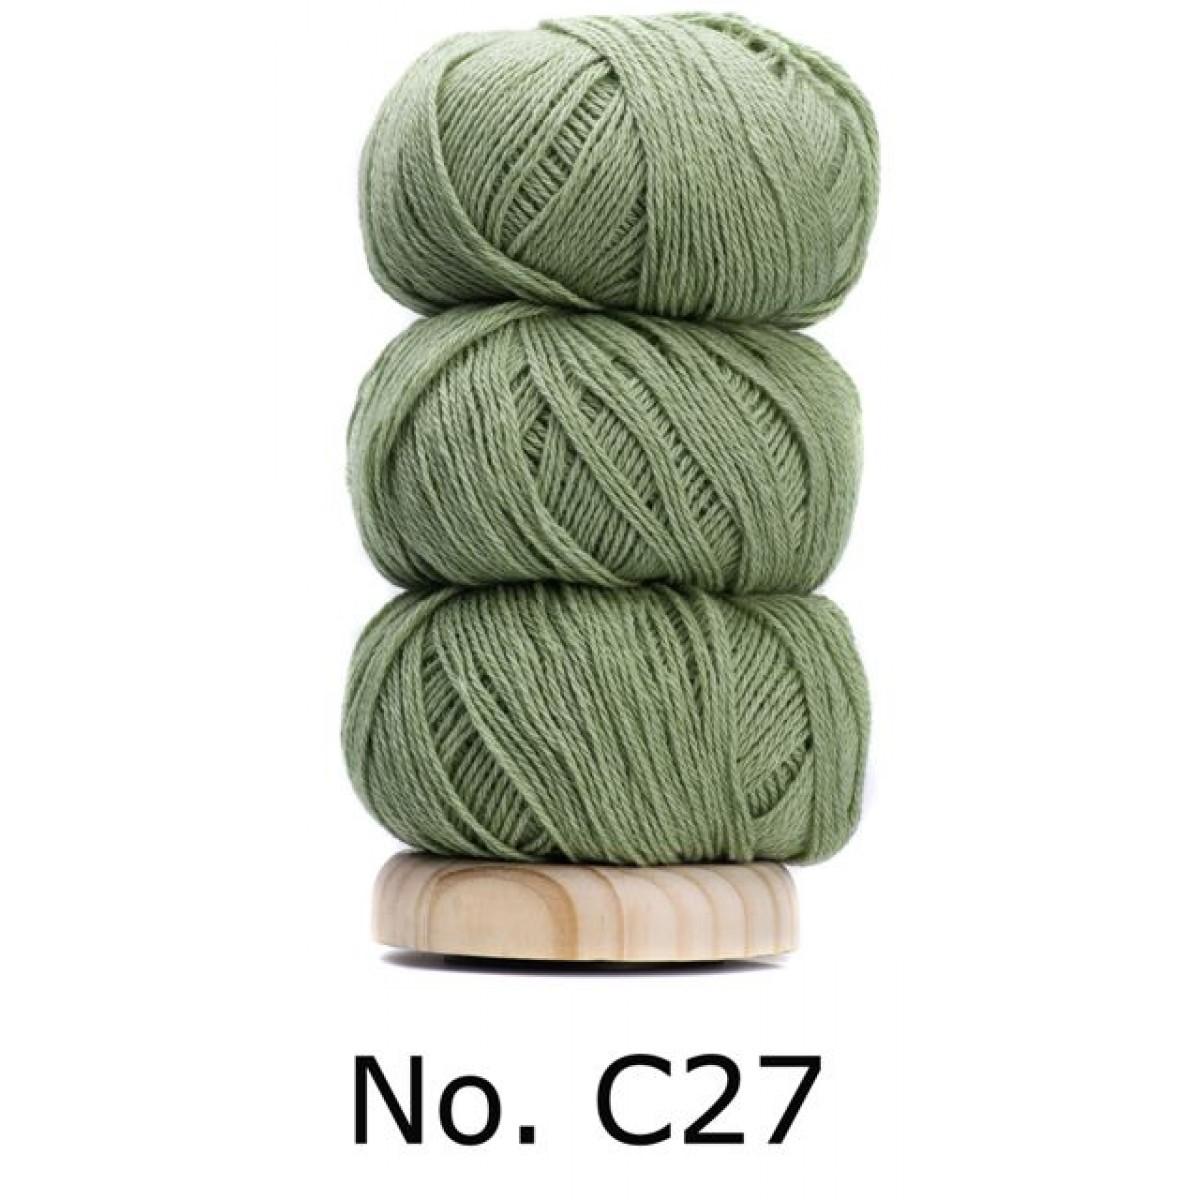 Snurretop-37